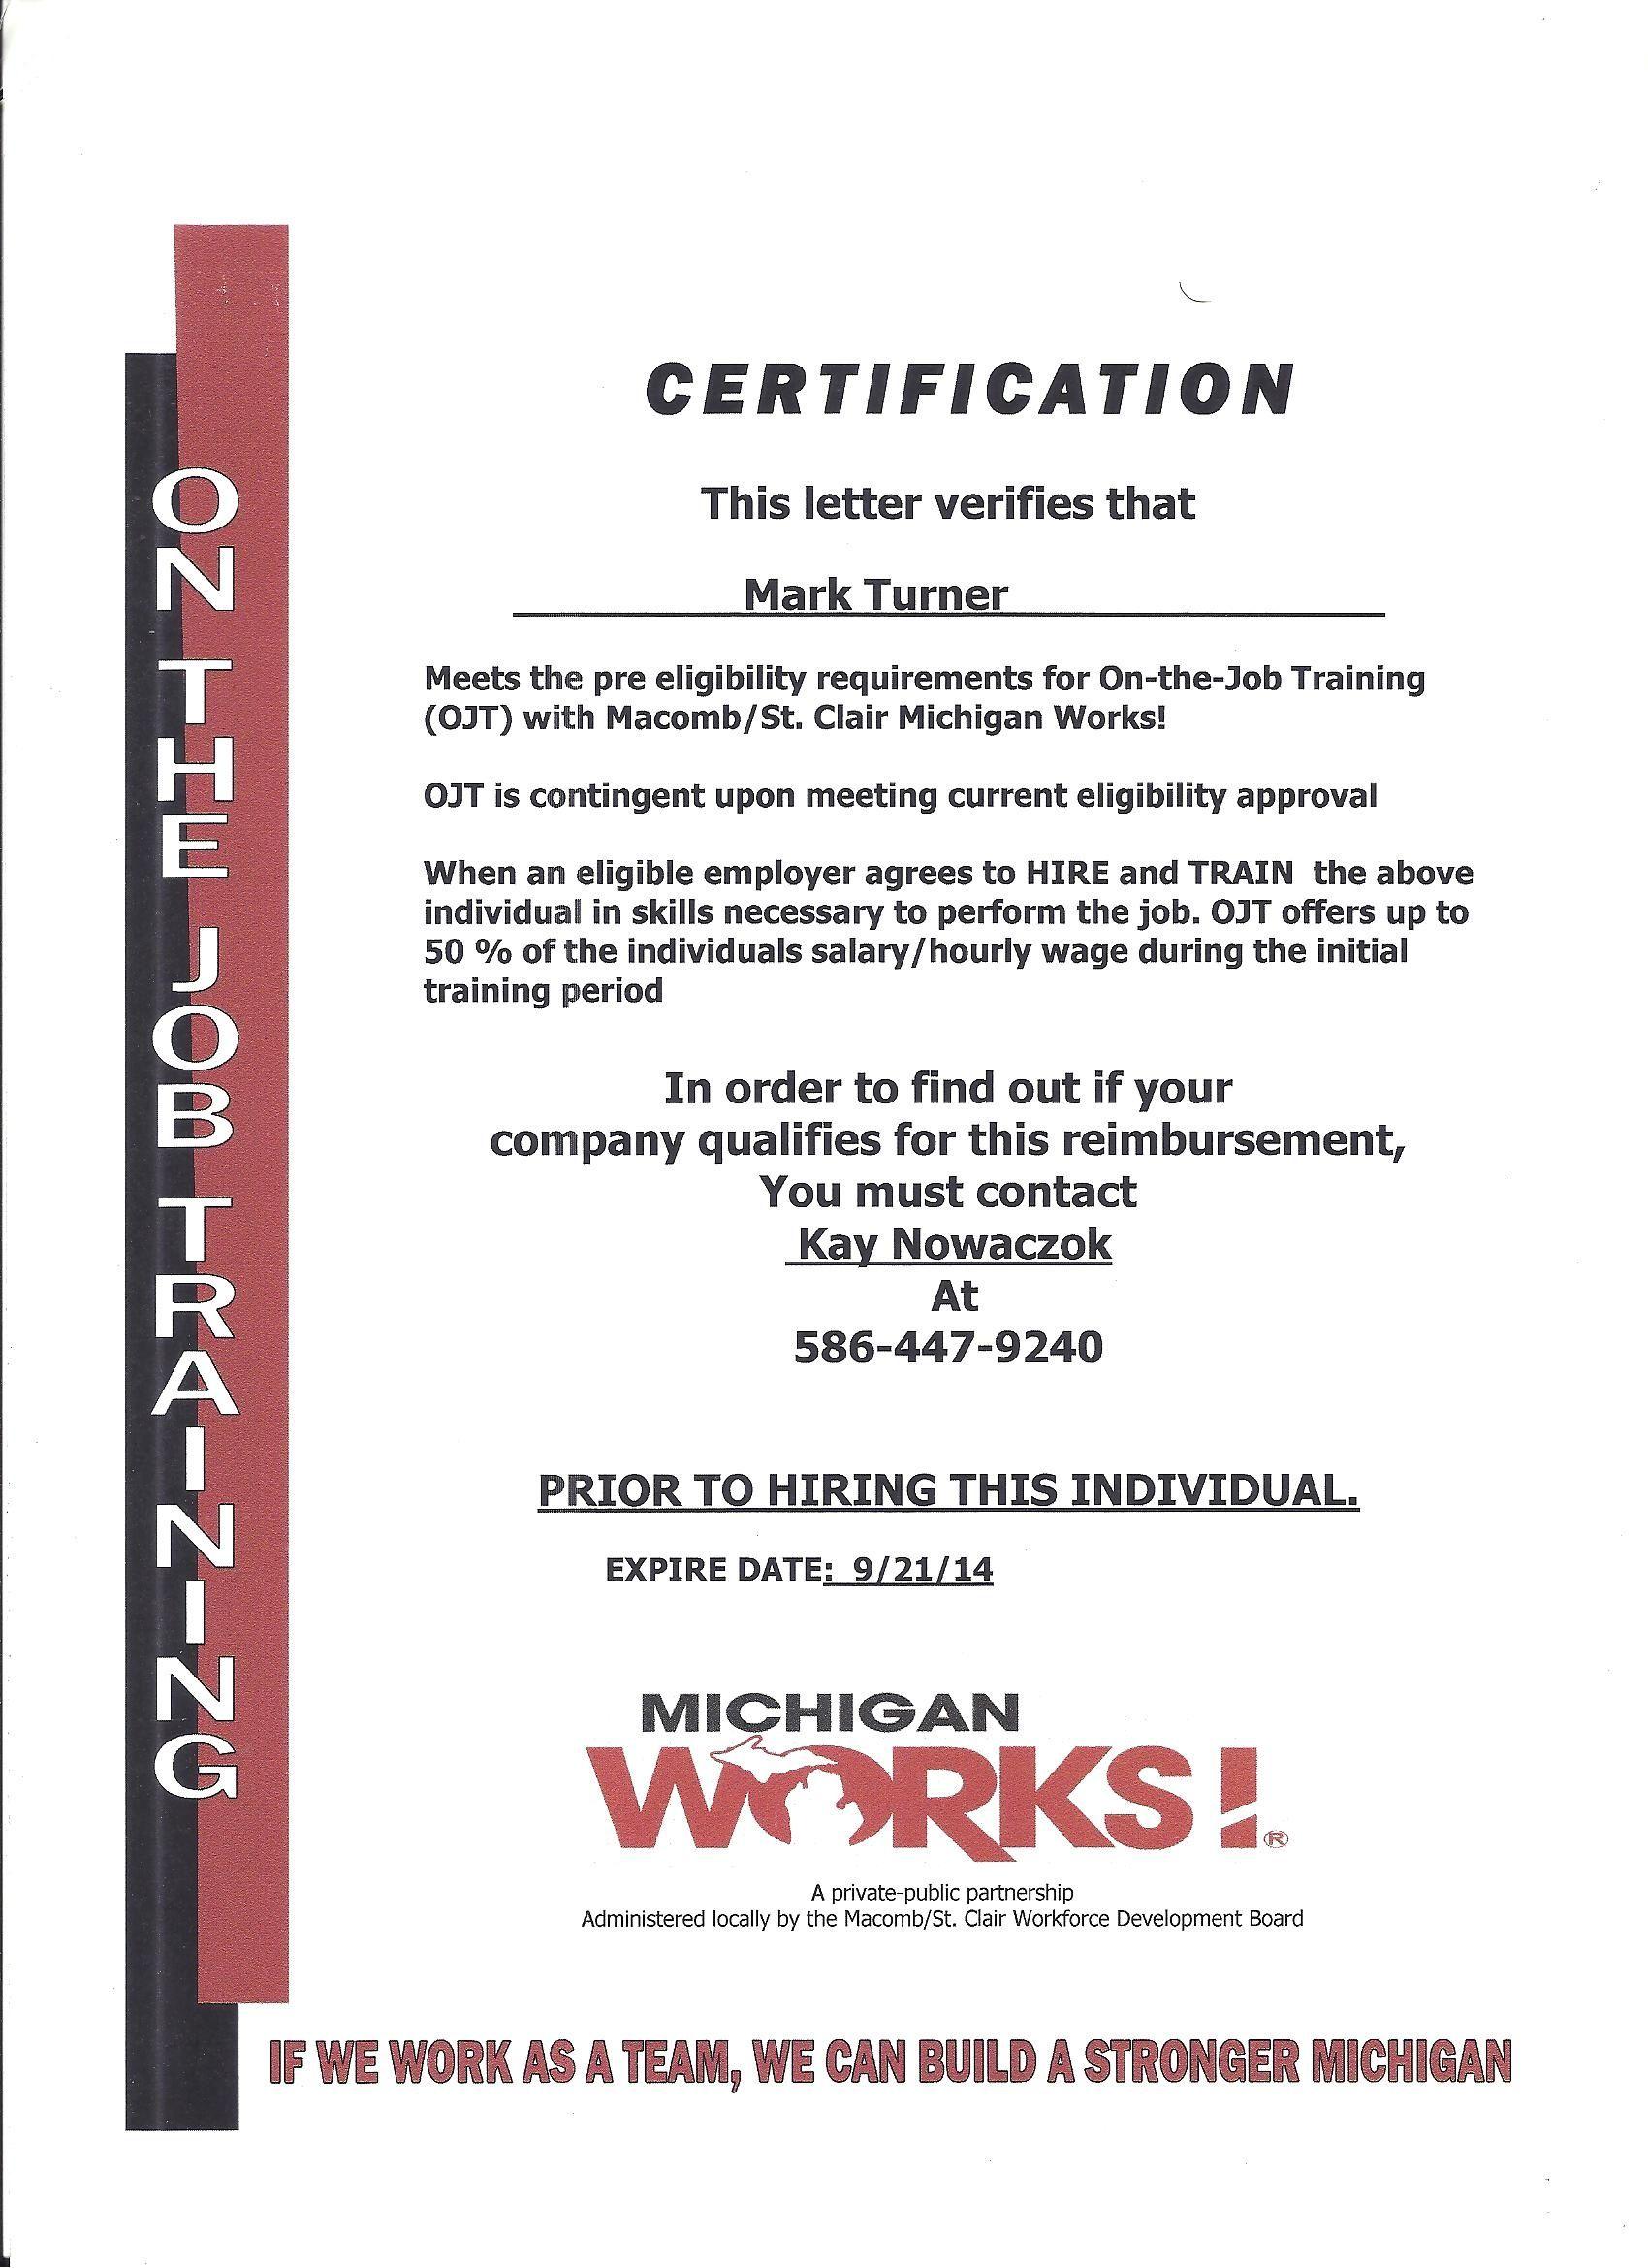 Ojt Certification Mark Turner All Things Considered Pinterest